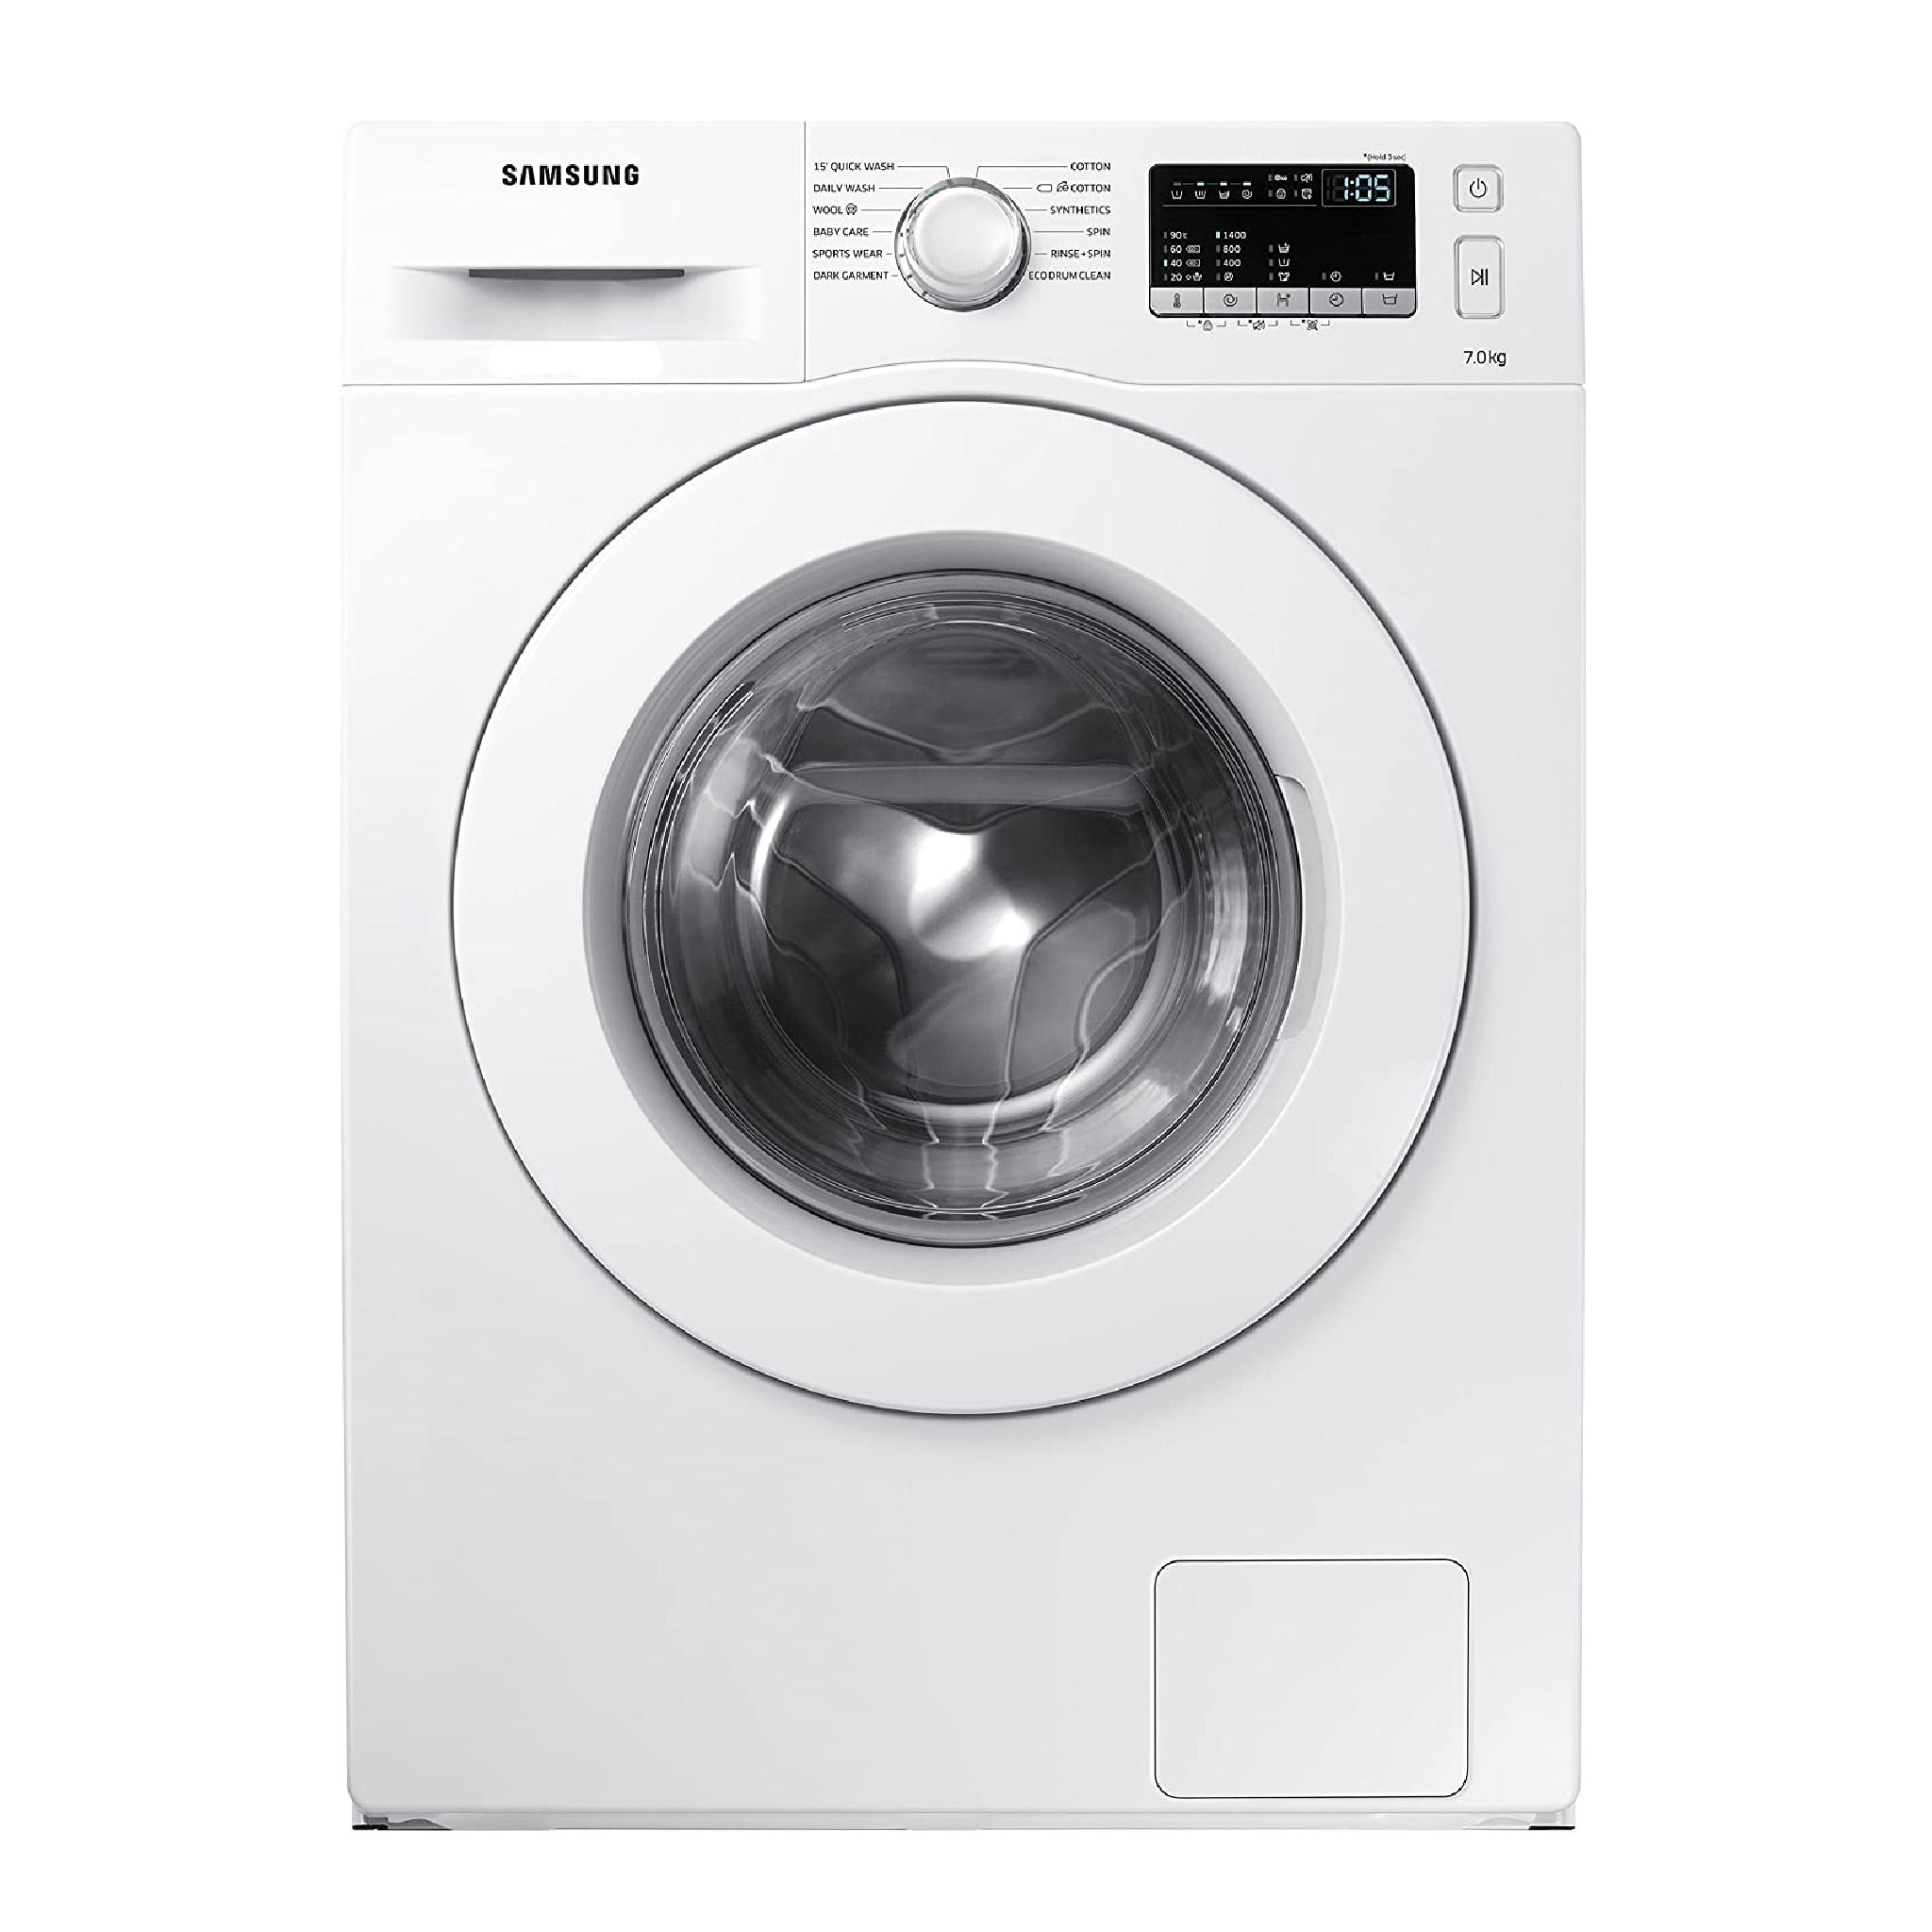 Best front loading washing machines - Samsung Front Load Washing Machine